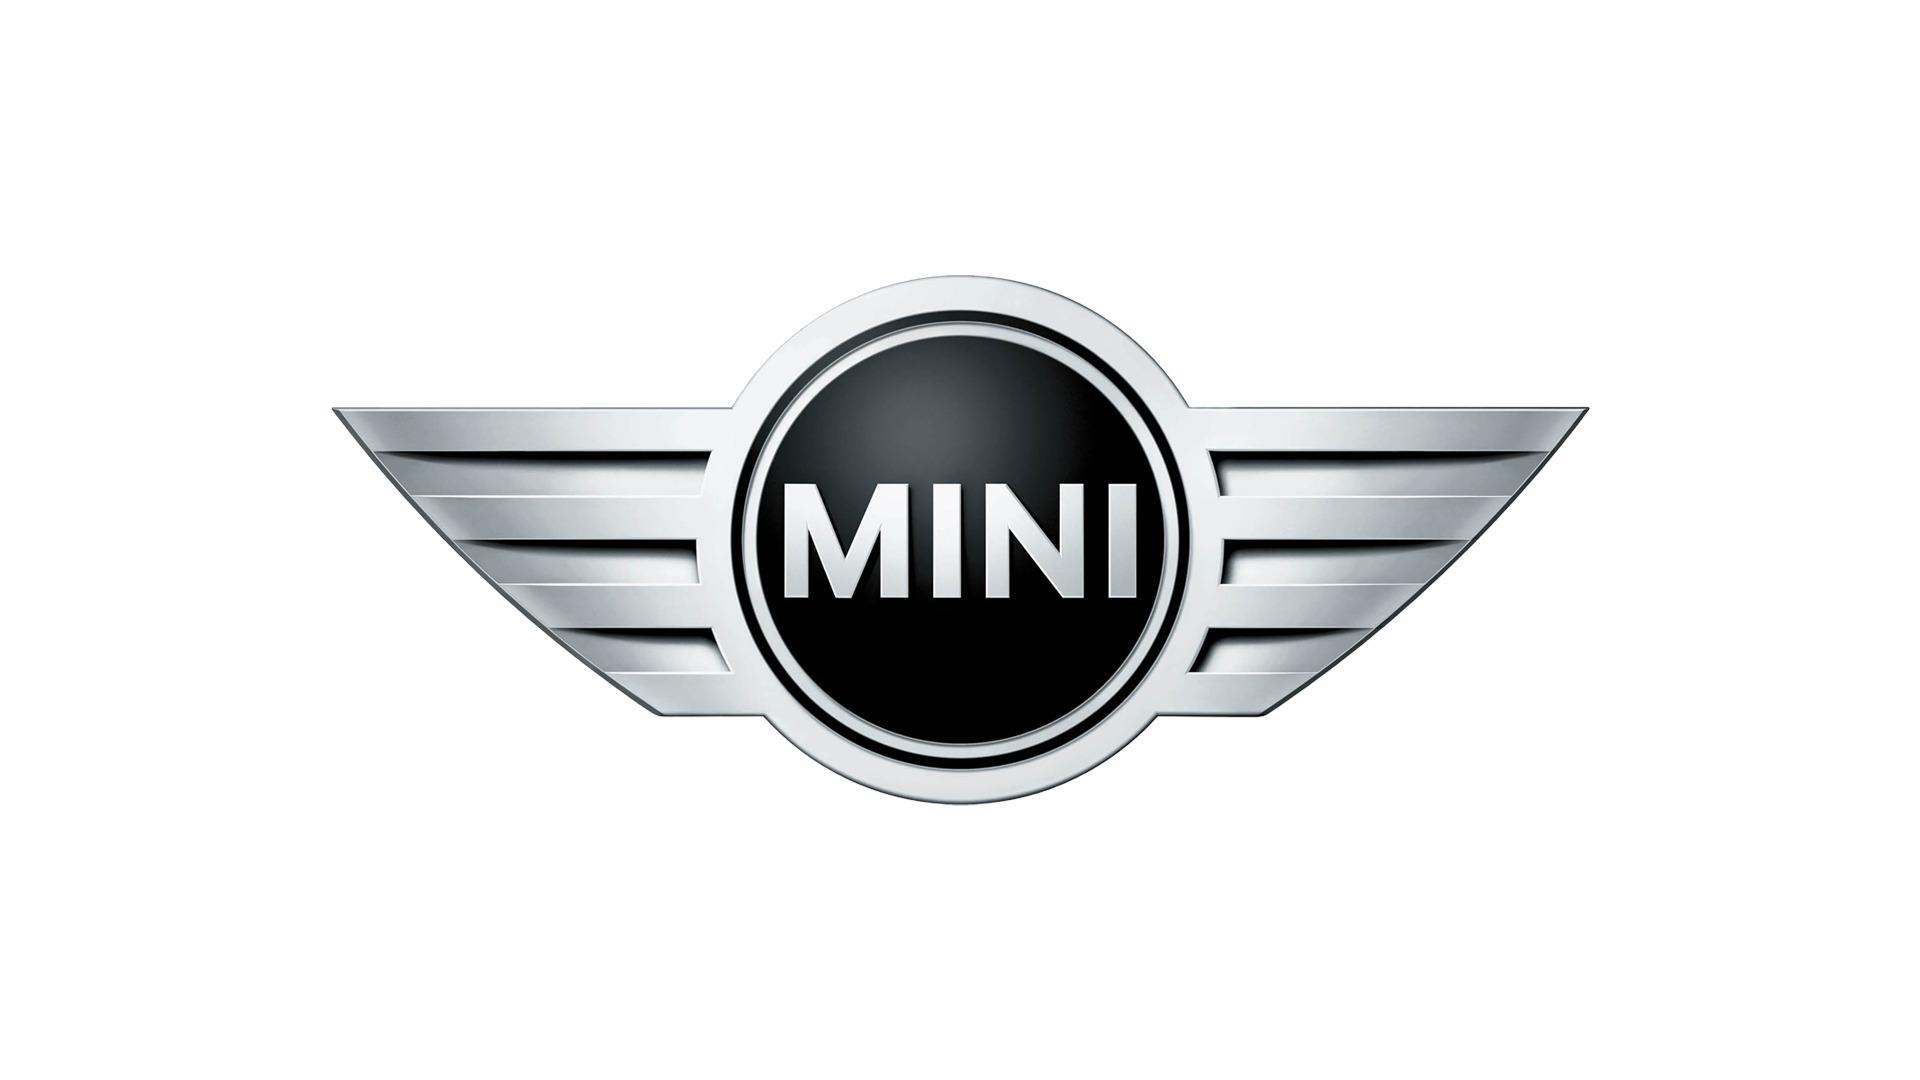 Imagen logo de Mini